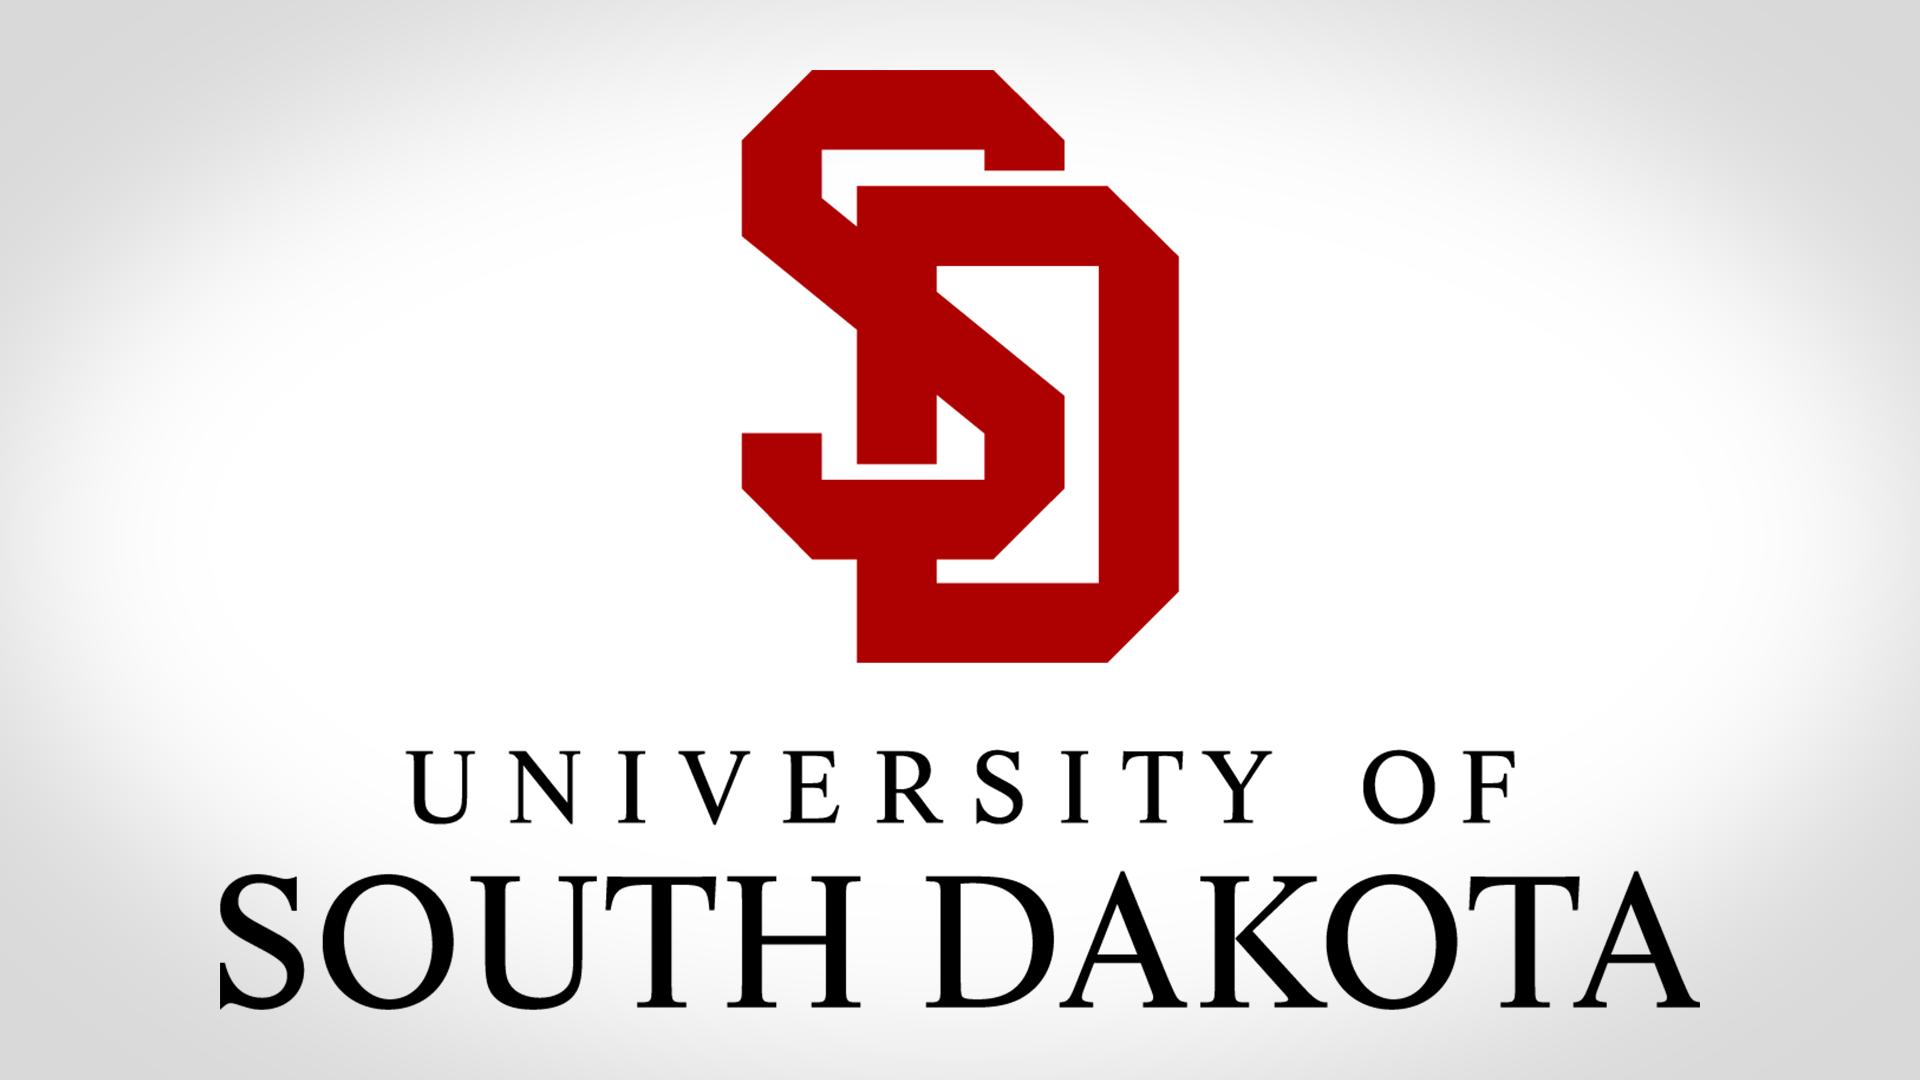 USD University of South Dakota logo_1551712249621.png.jpg